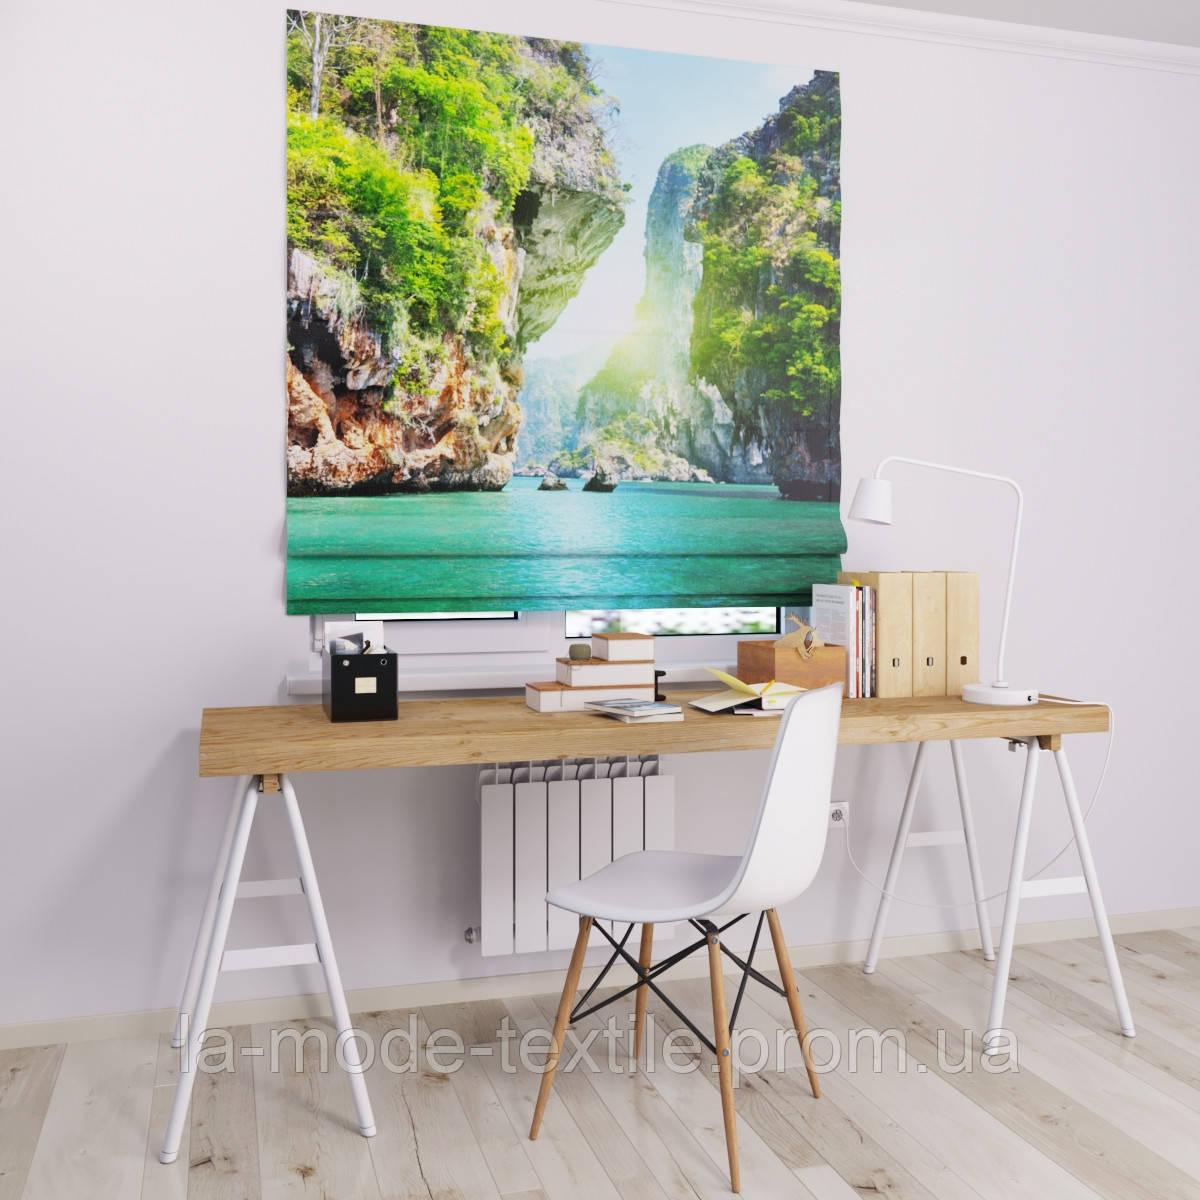 Римска штора с фотопечатью Водопад